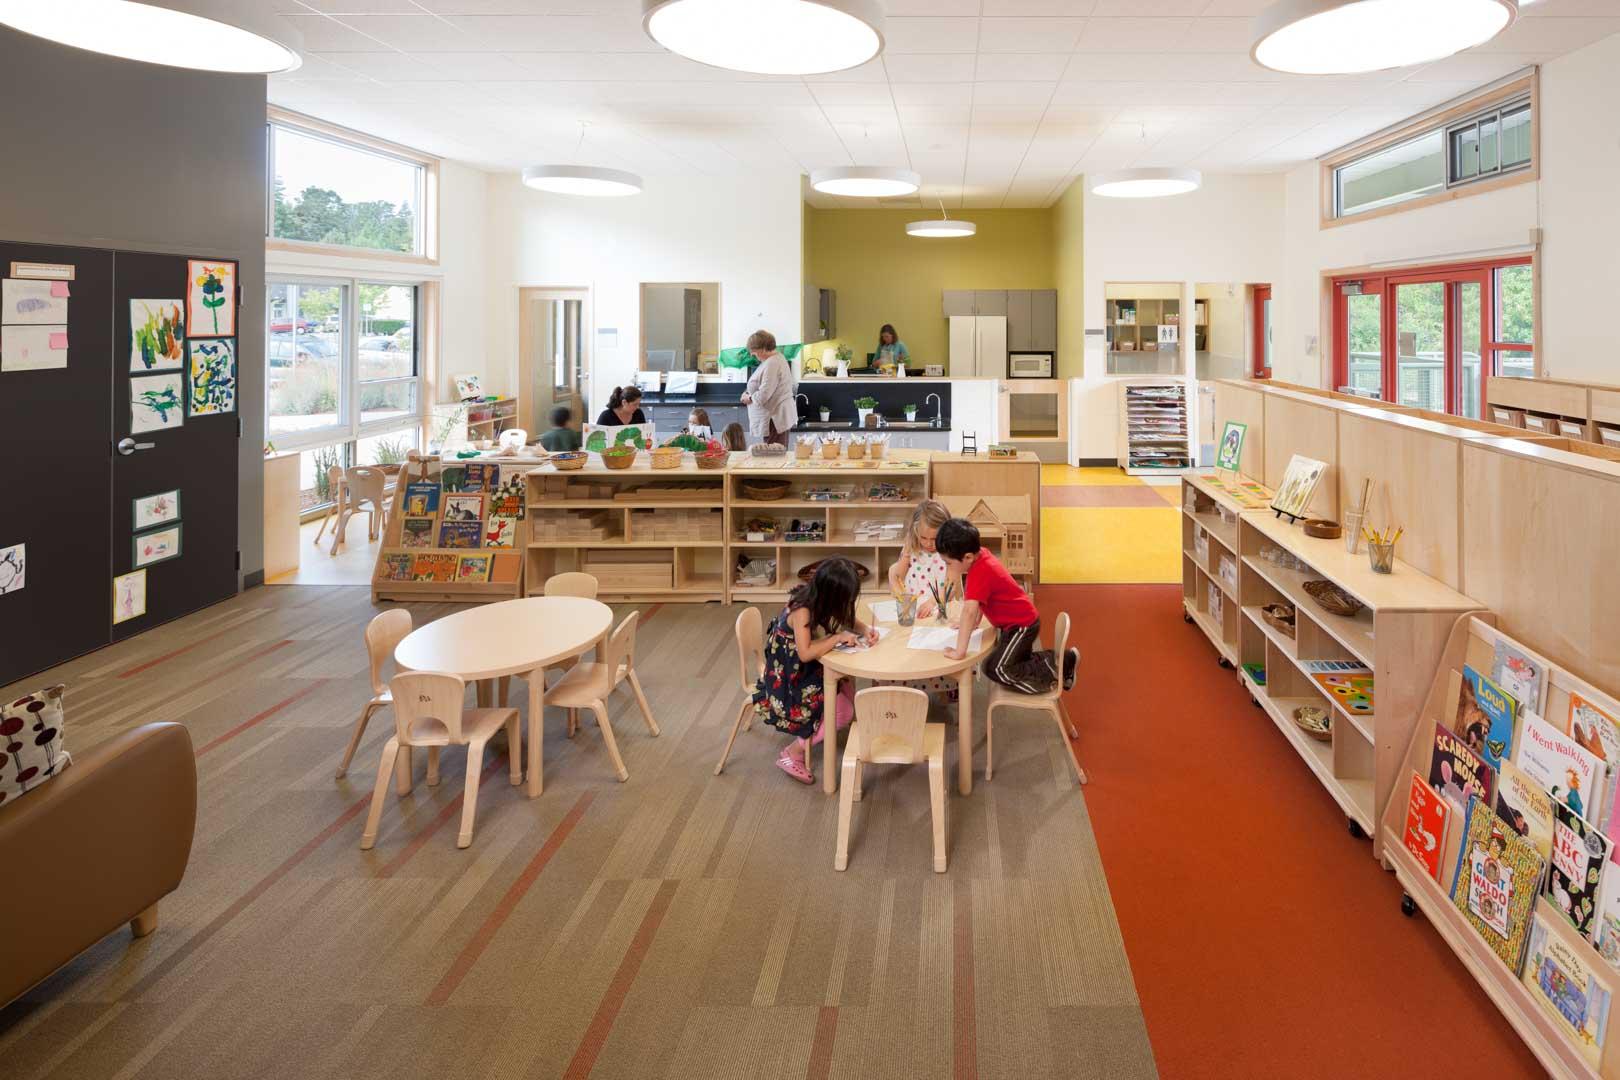 College Of Marin Child Study Center Studio Bondy Architecture